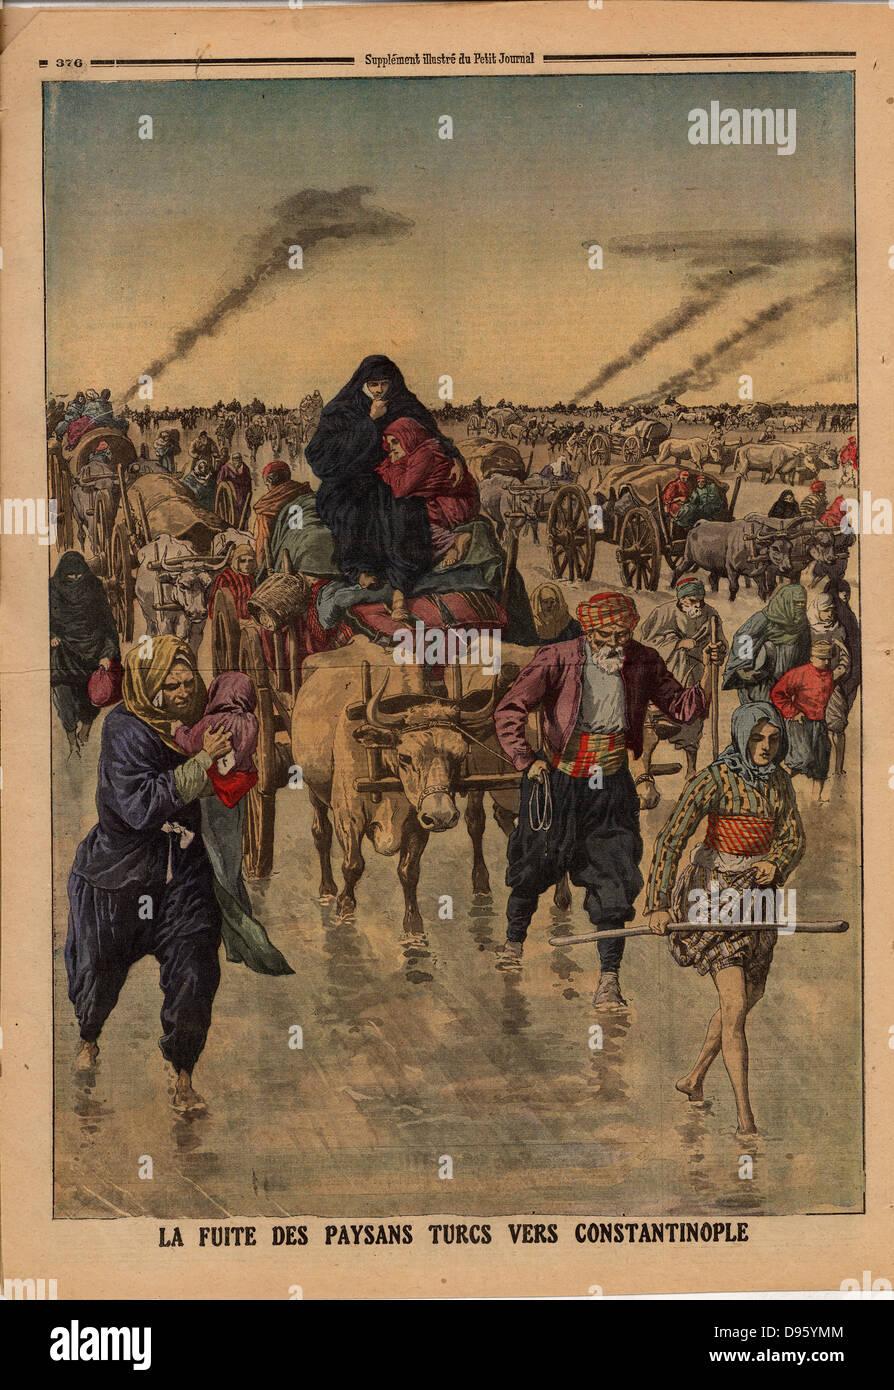 Balkan Wars: Flight of Turkish peasants towards Constantinople. From 'Le Petit Journal', Paris, 24 November - Stock Image